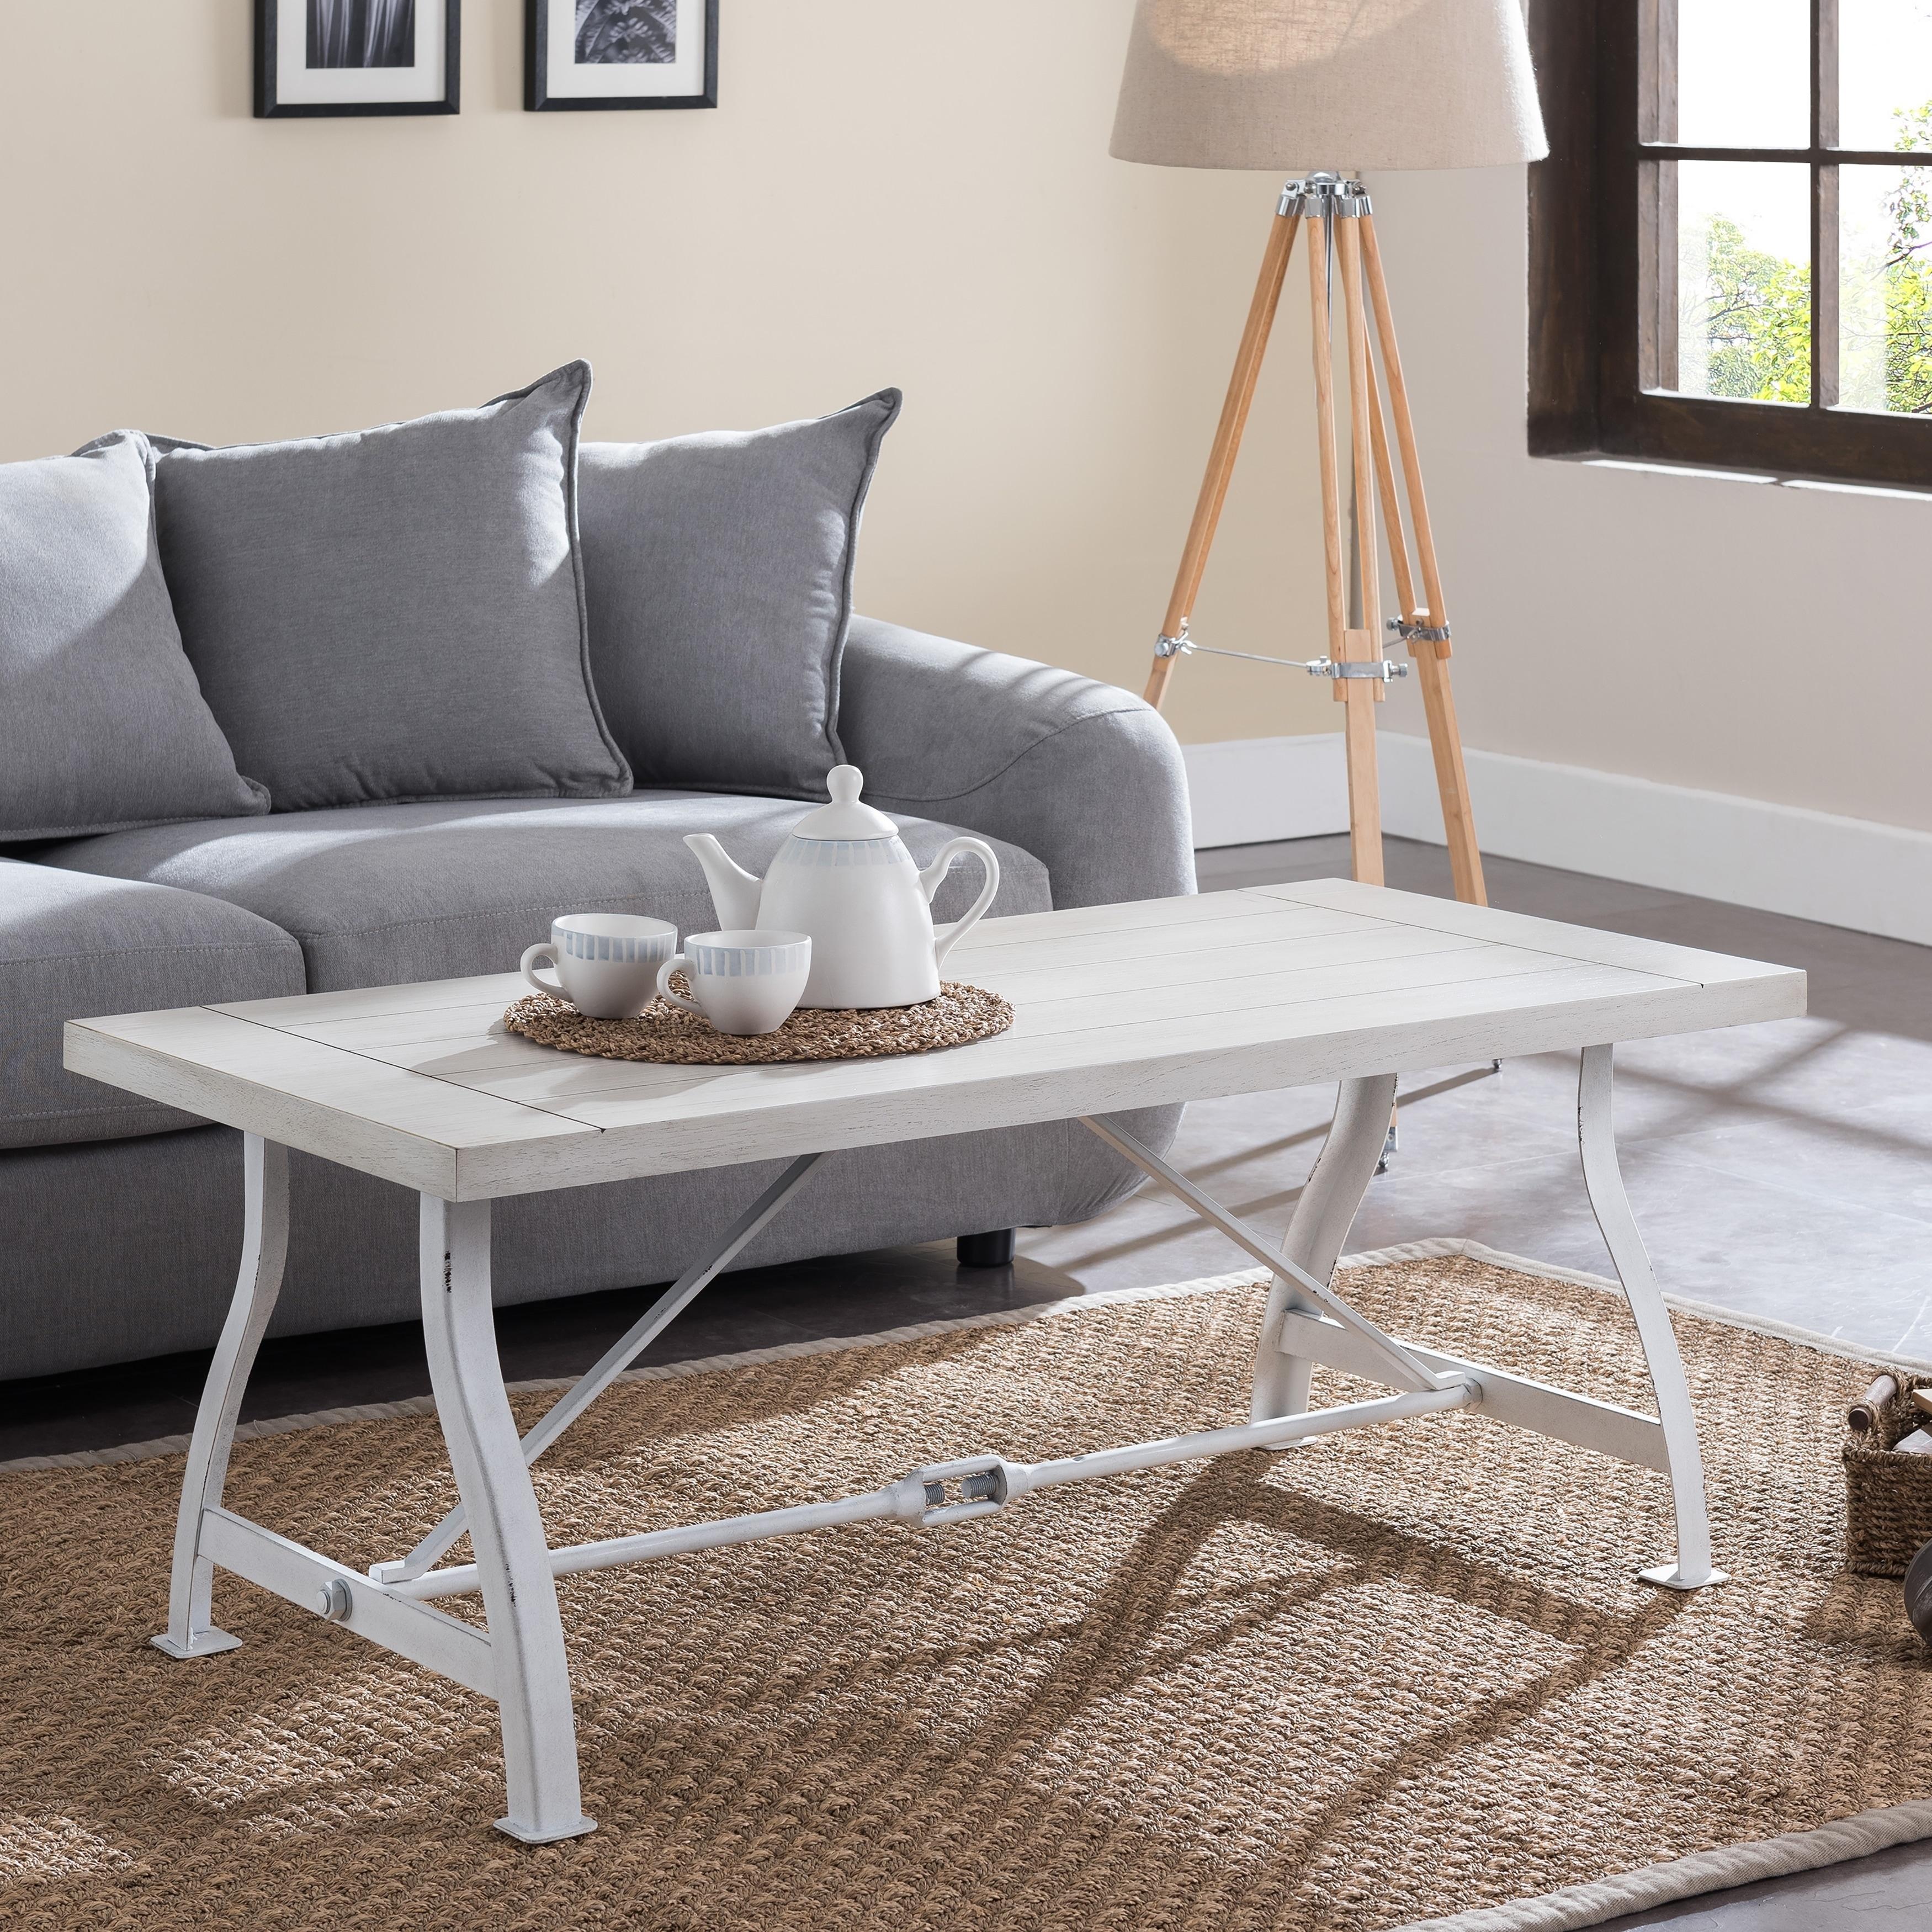 - Shop Jaiden Distressed White Farmhouse Coffee Table - Overstock - 22363874